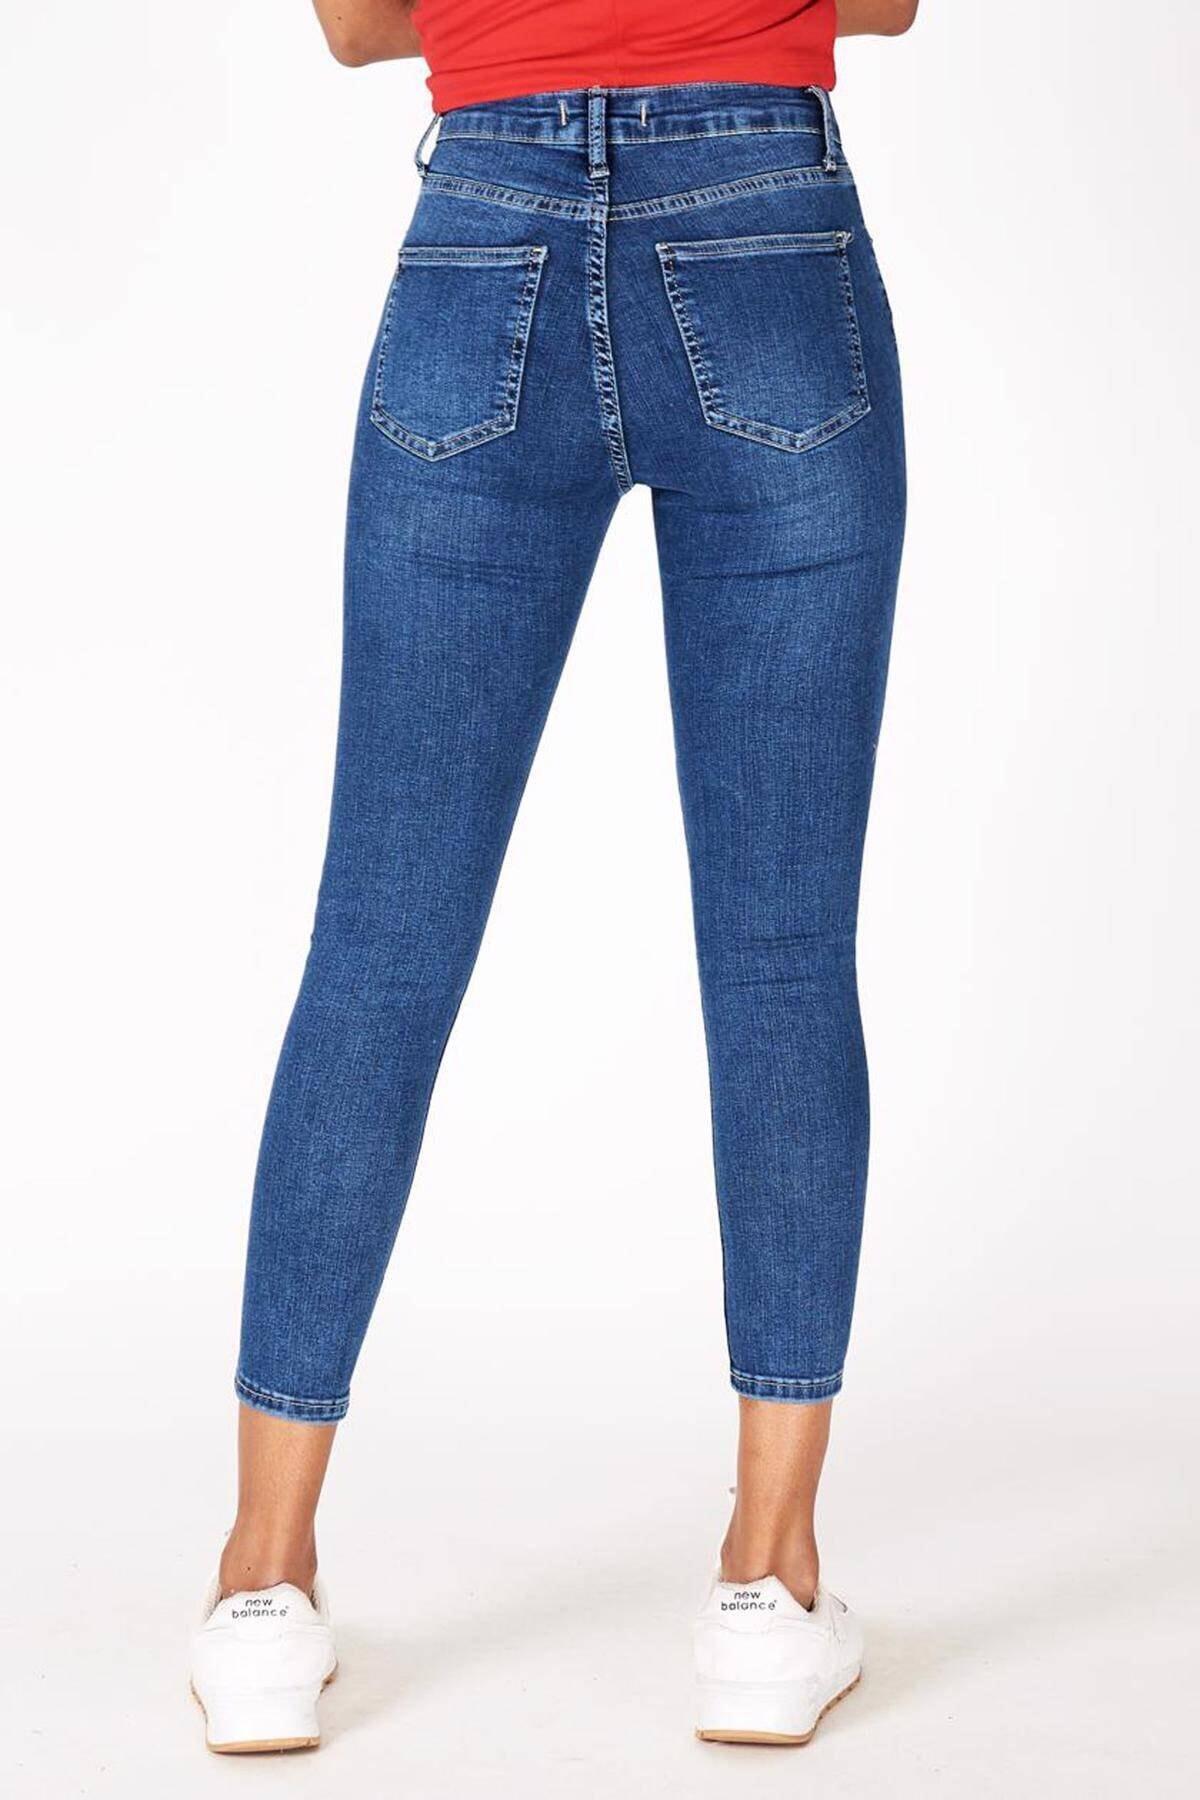 Addax Kadın Kot Rengi Orta Bel Pantolon Pn5799 - Pnr ADX-0000016979 4